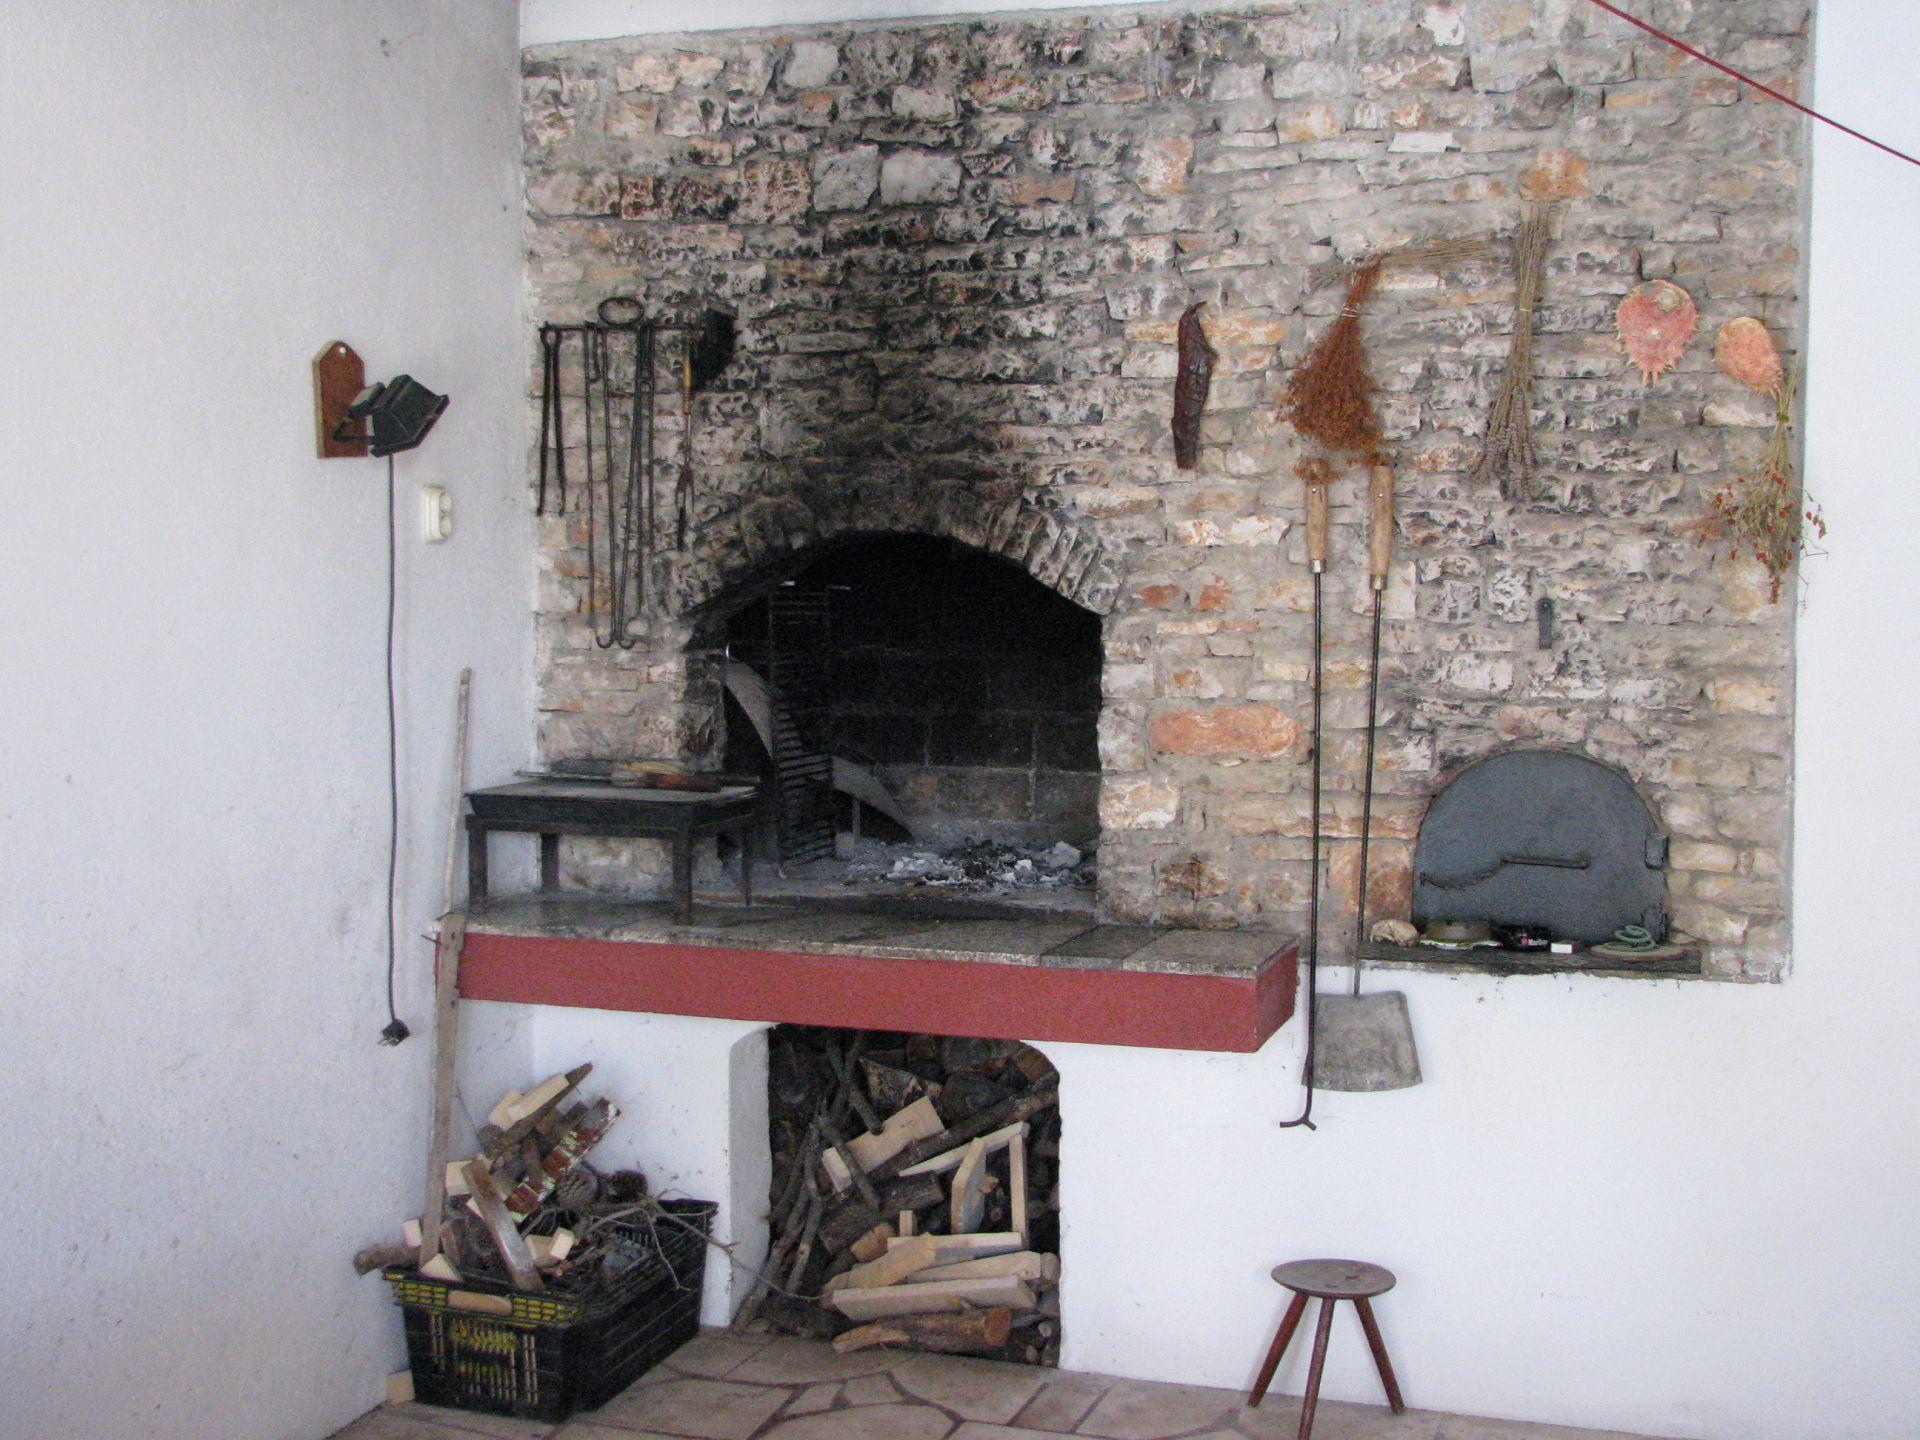 Simi - Baai Osibova (Milna) - Verblijf in lagunes Kroatië - barbecue